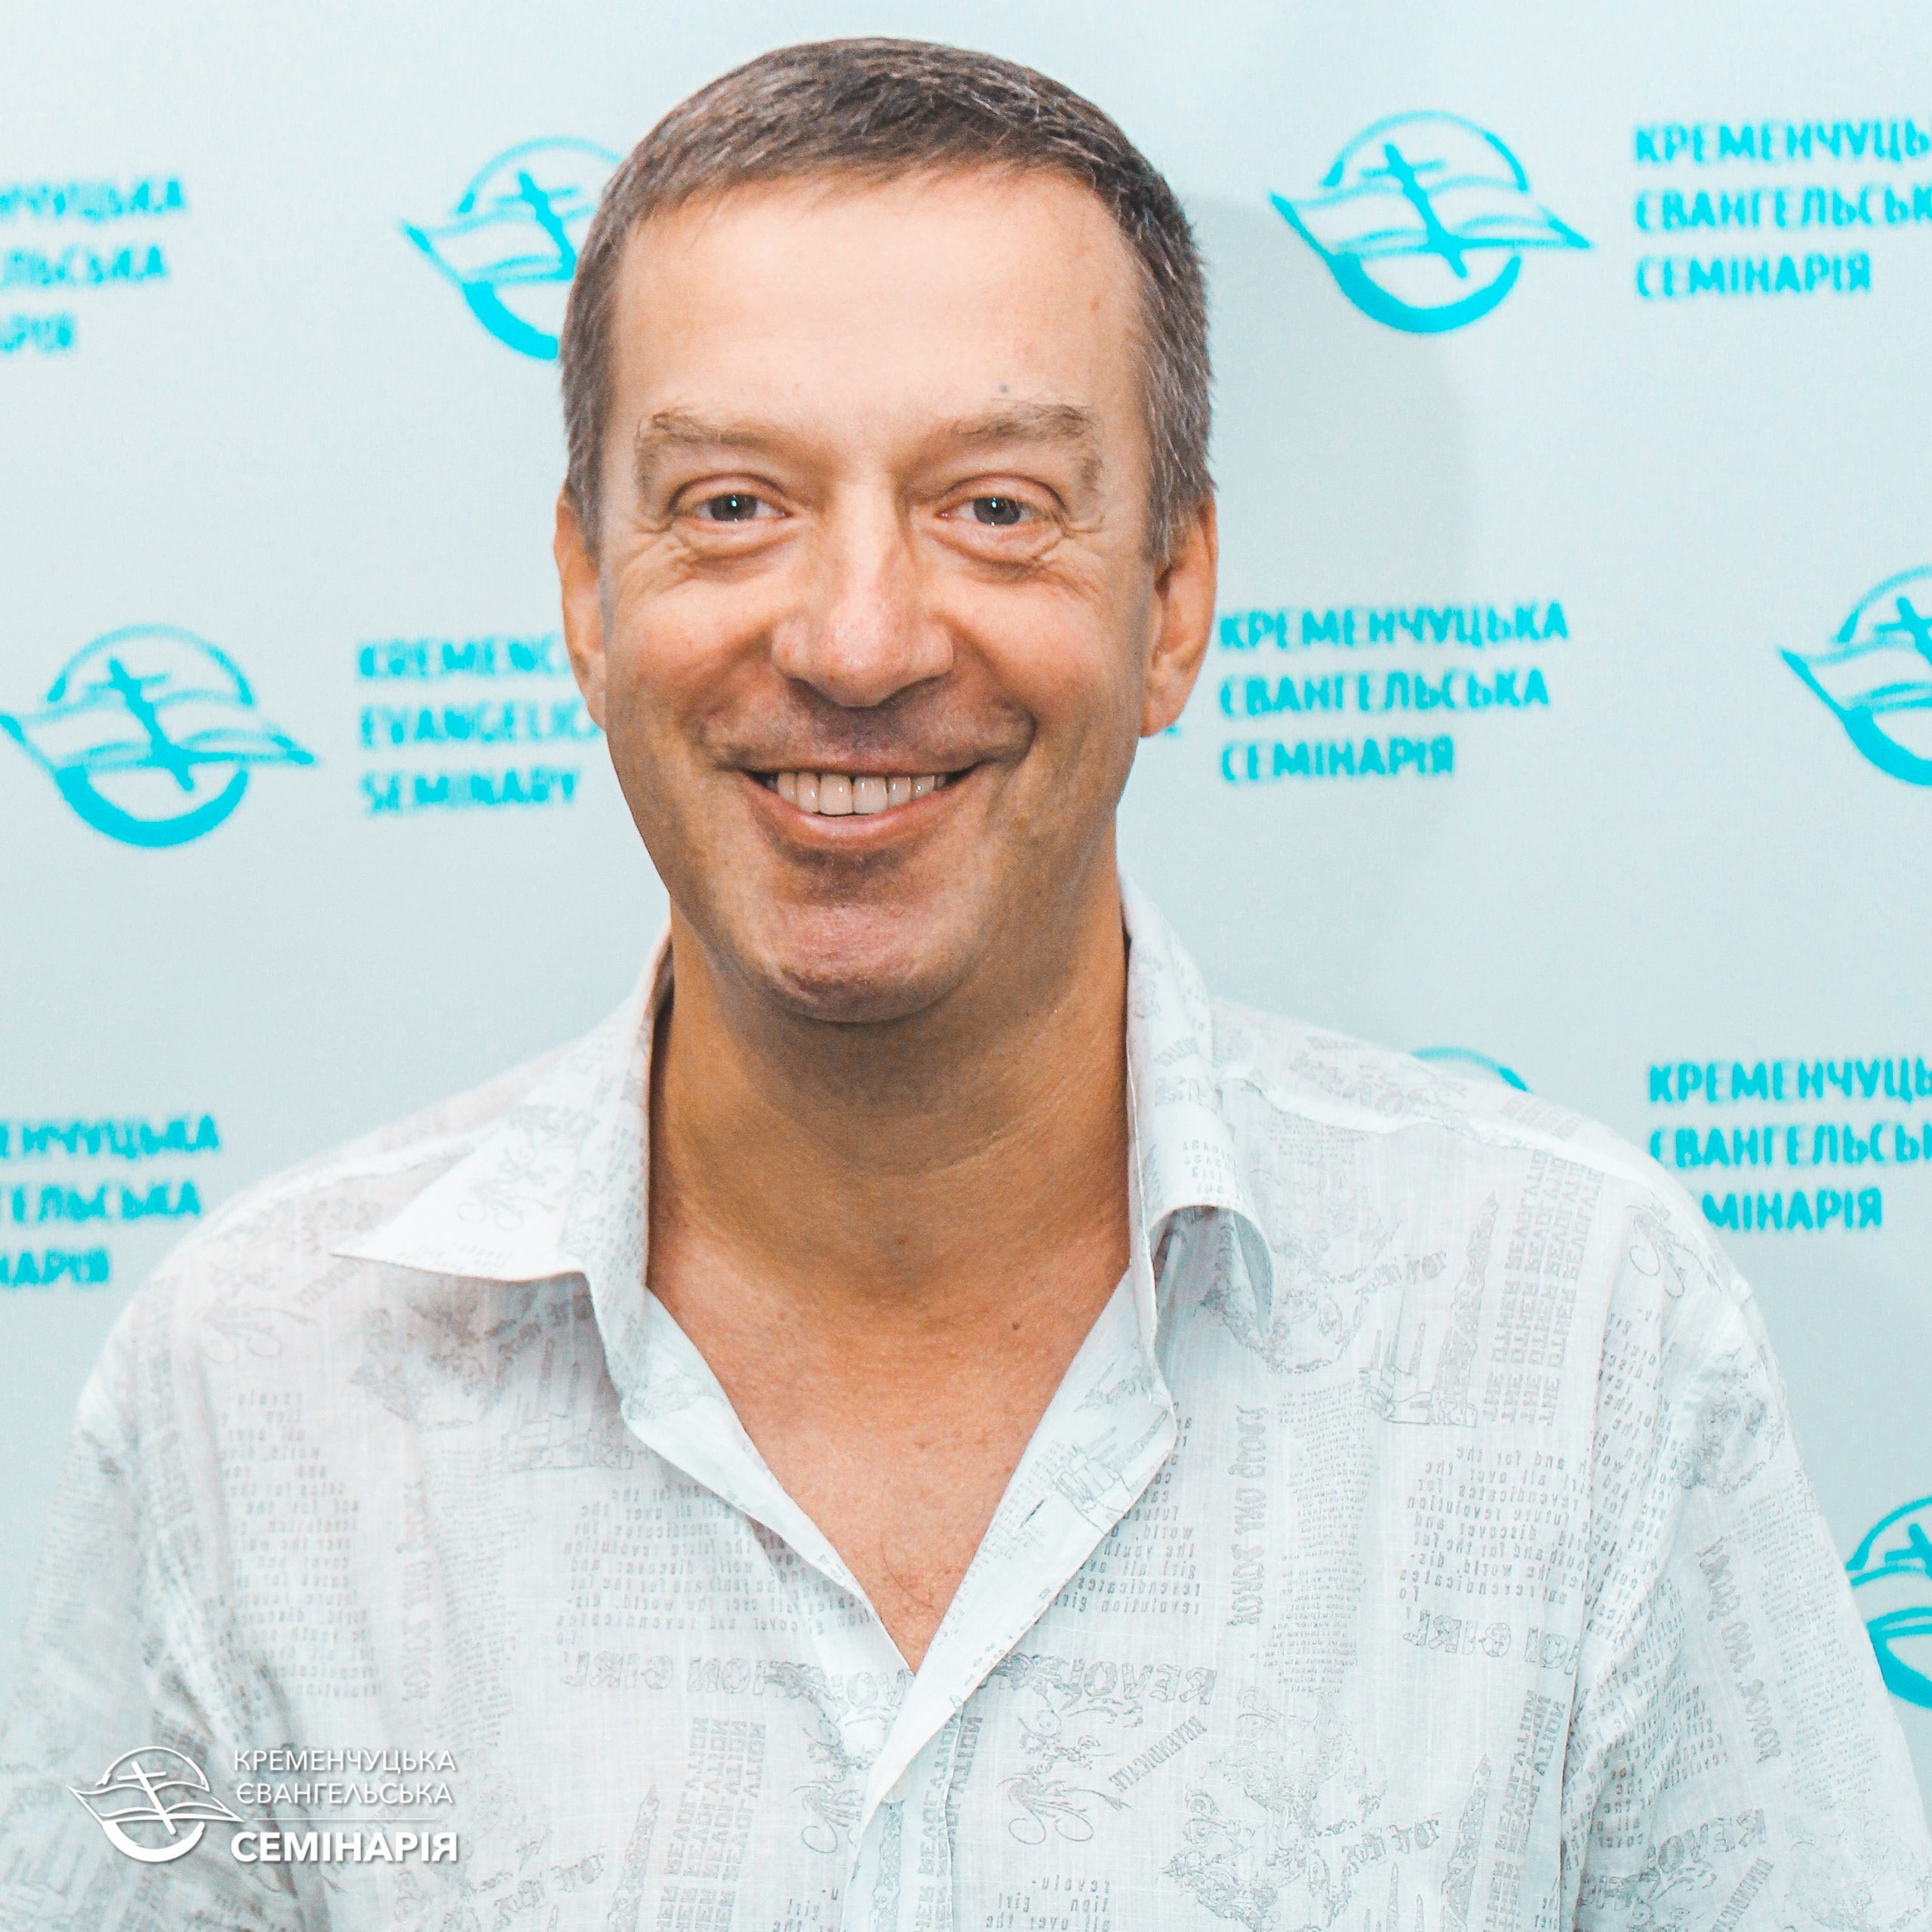 Бражник Юрий Владимирович